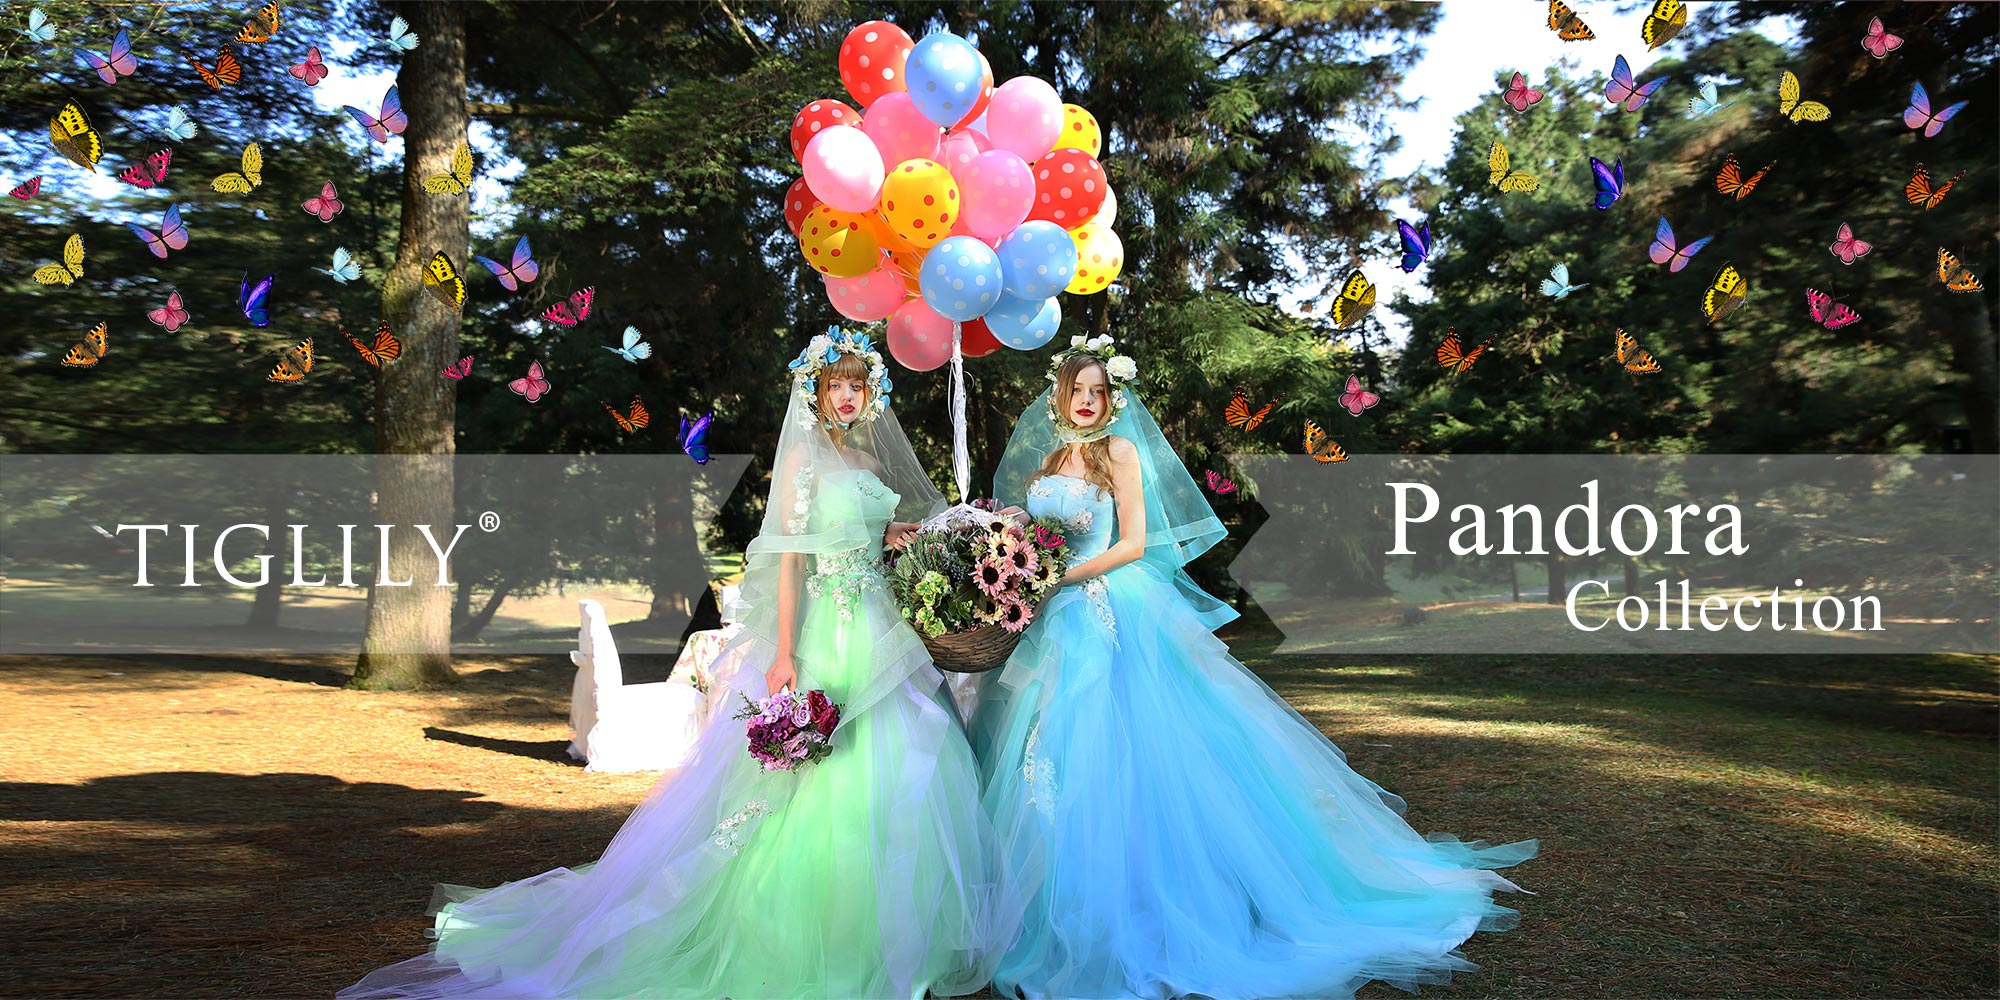 PANDORA(パンドラ) - TIGLILY COLLECTION